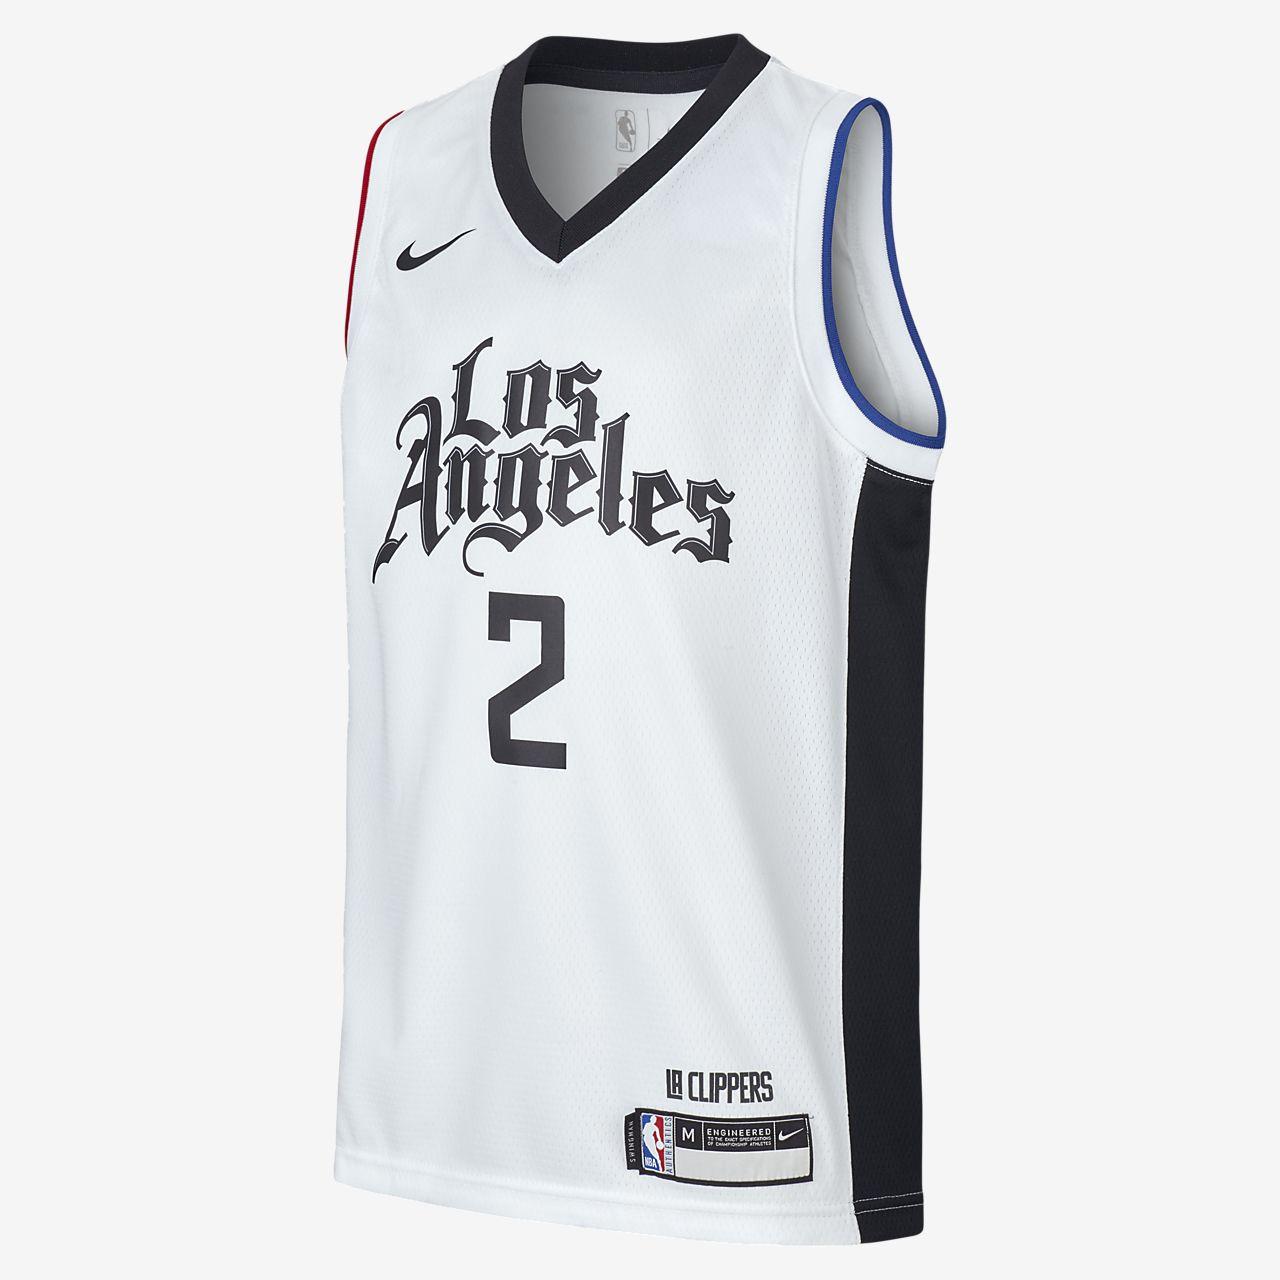 Camisola NBA da Nike Swingman Kawhi Leonard Clippers City Edition Júnior